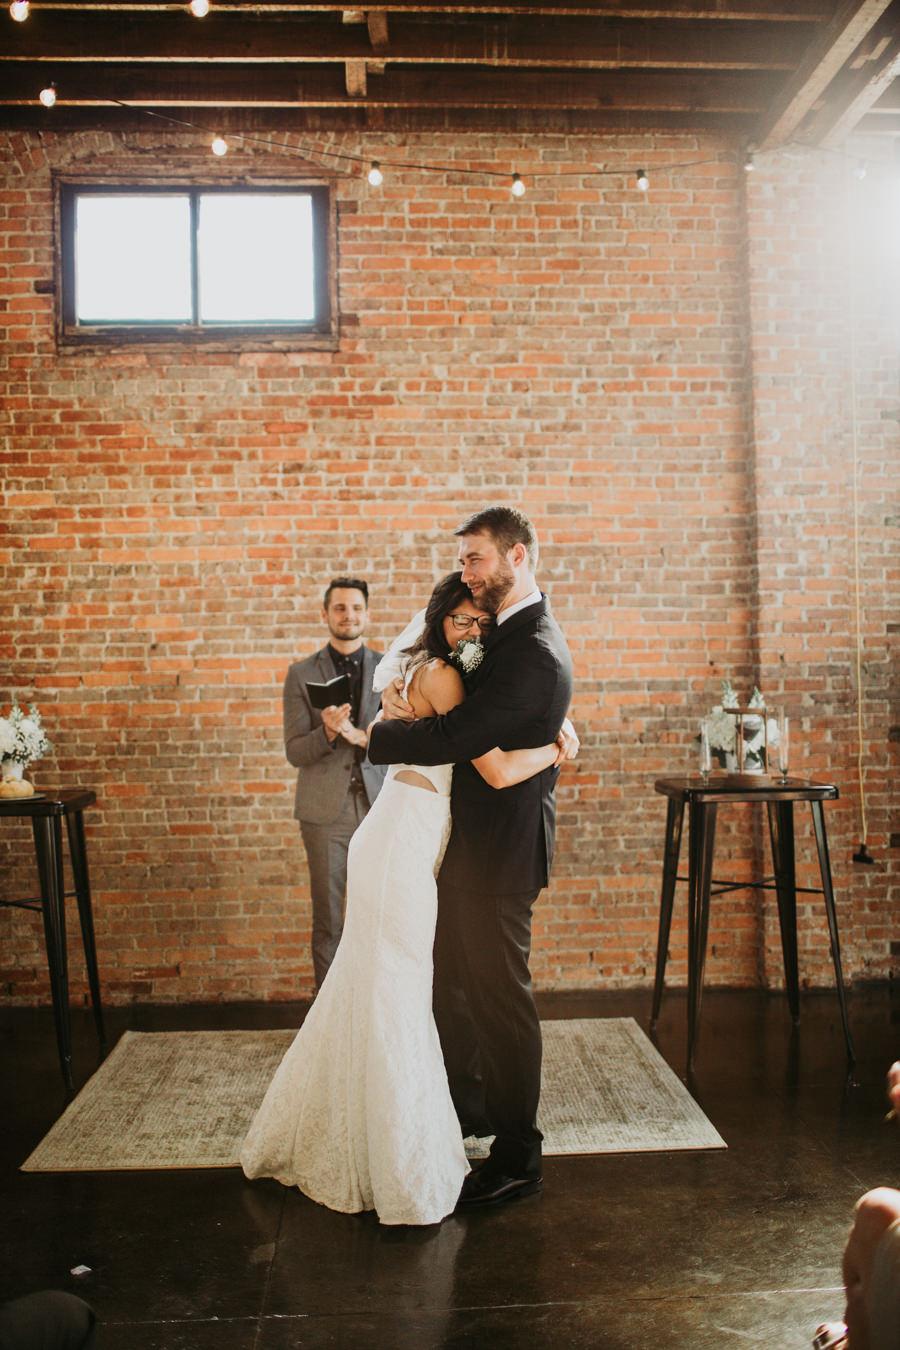 Tampa Heights Industrial Wedding at Cavu Emmy RJ-82.jpg